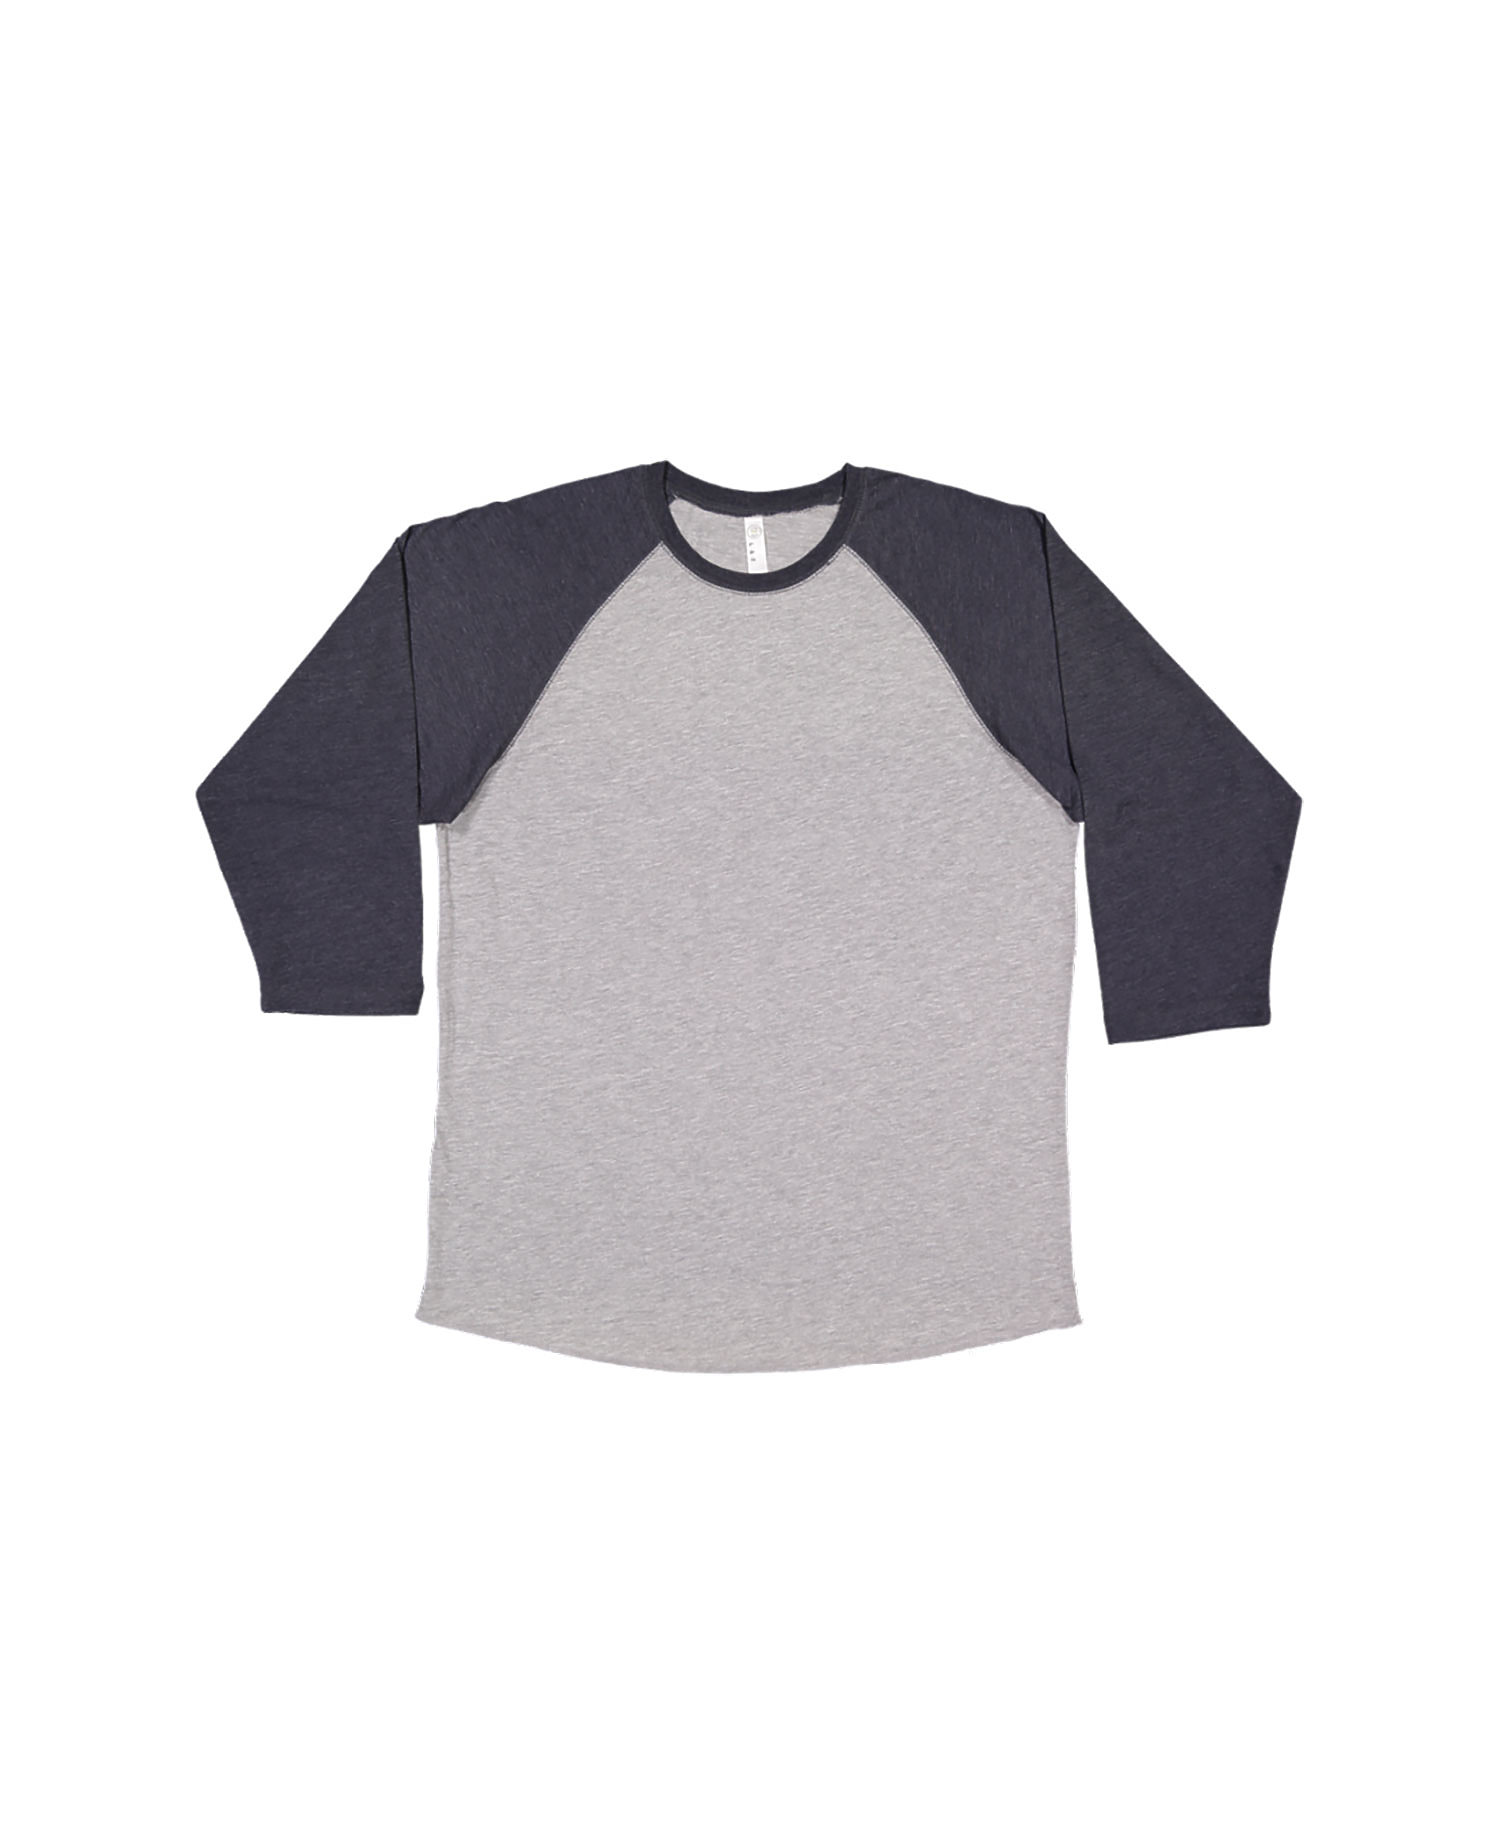 Lat 6930 Vintage Fine Jersey Three Quarter Sleeve Baseball T Shirt